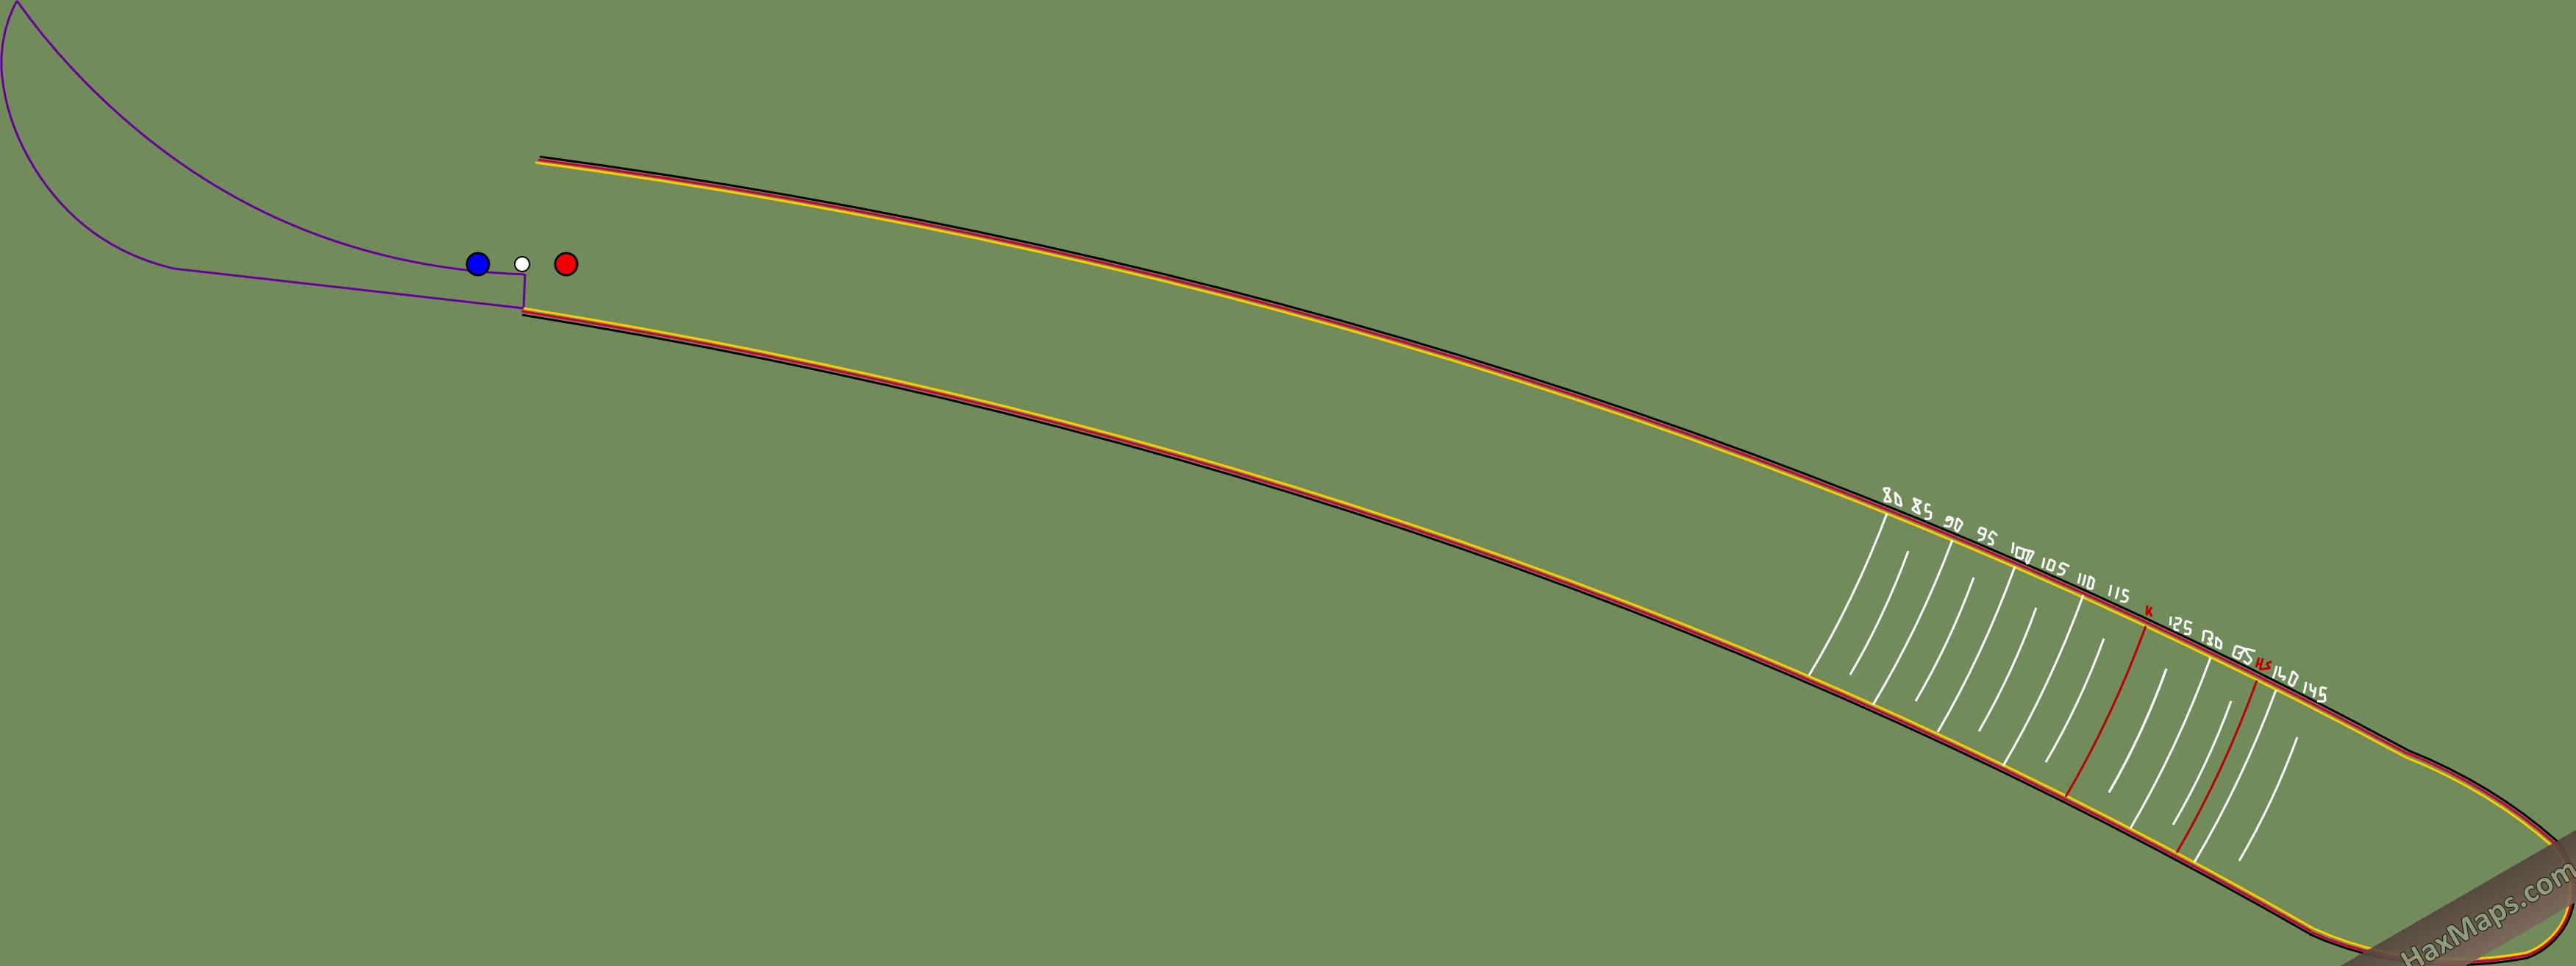 hax ball maps | Oberstdorf K120 HS137